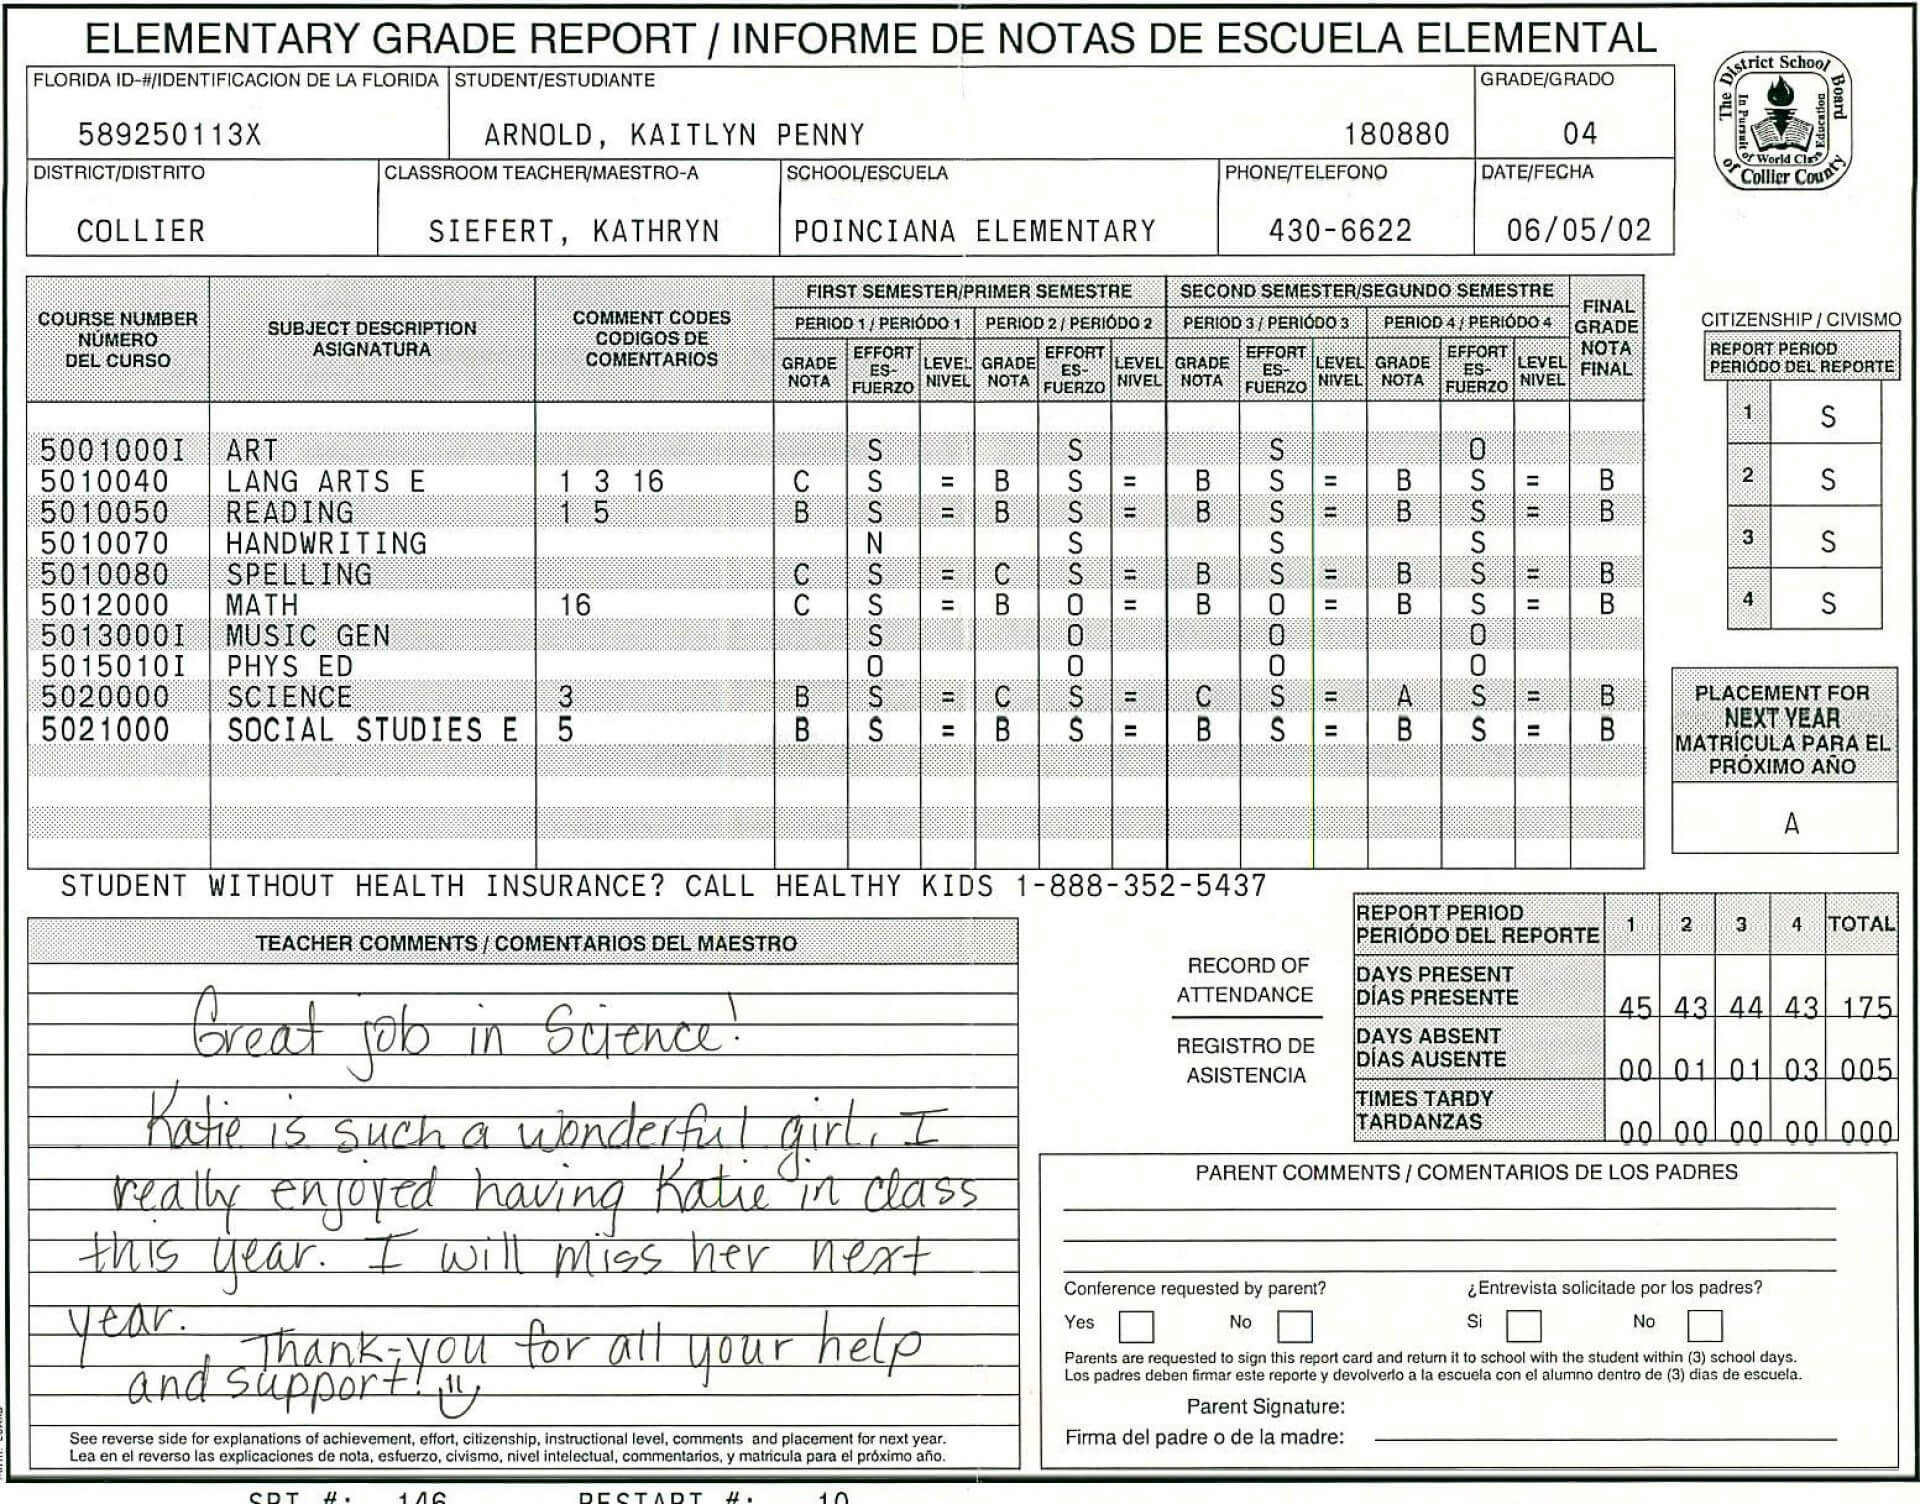 002 Homeschool Report Card Template Free Ideas Breathtaking With Report Card Template Middle School